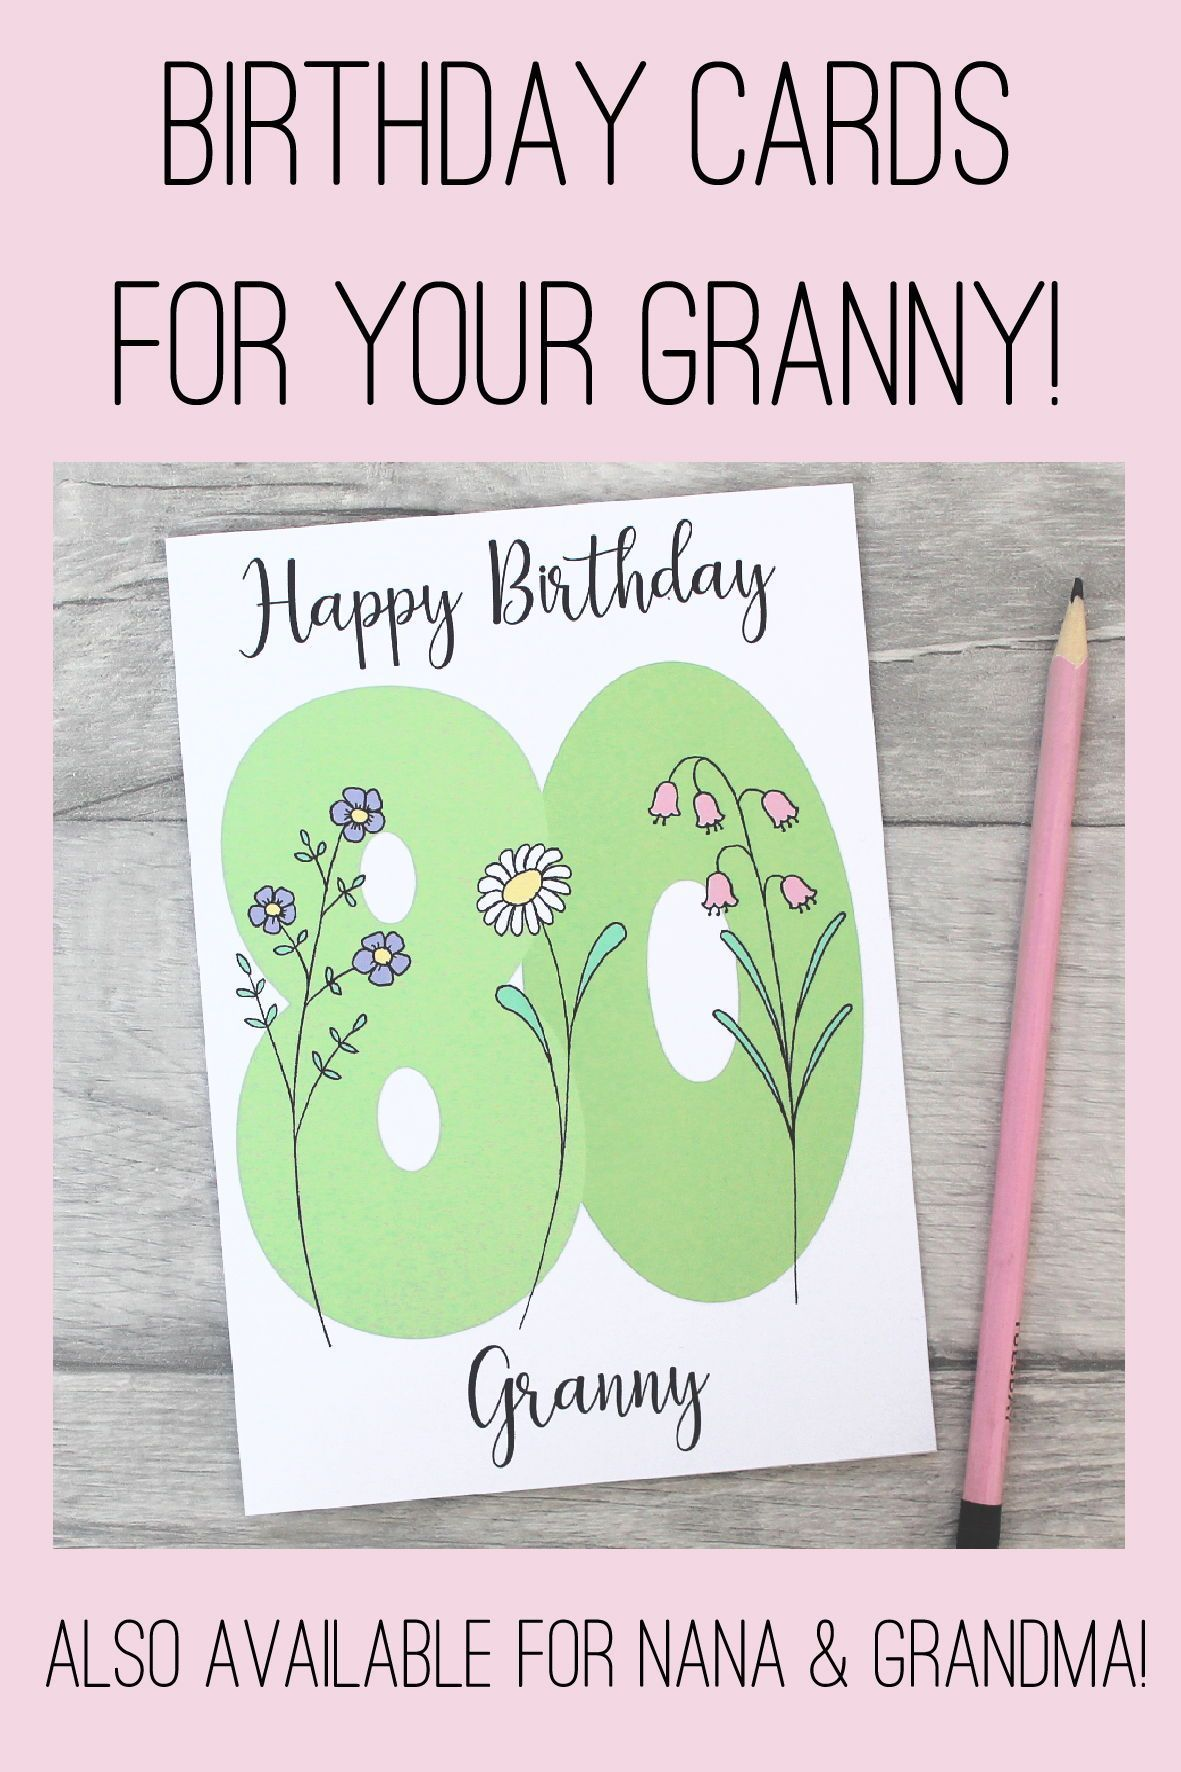 80th Happy Birthday Card Personalised Age 80 Card Etsy 80th Birthday Cards Grandma Birthday Card Happy Birthday Cards